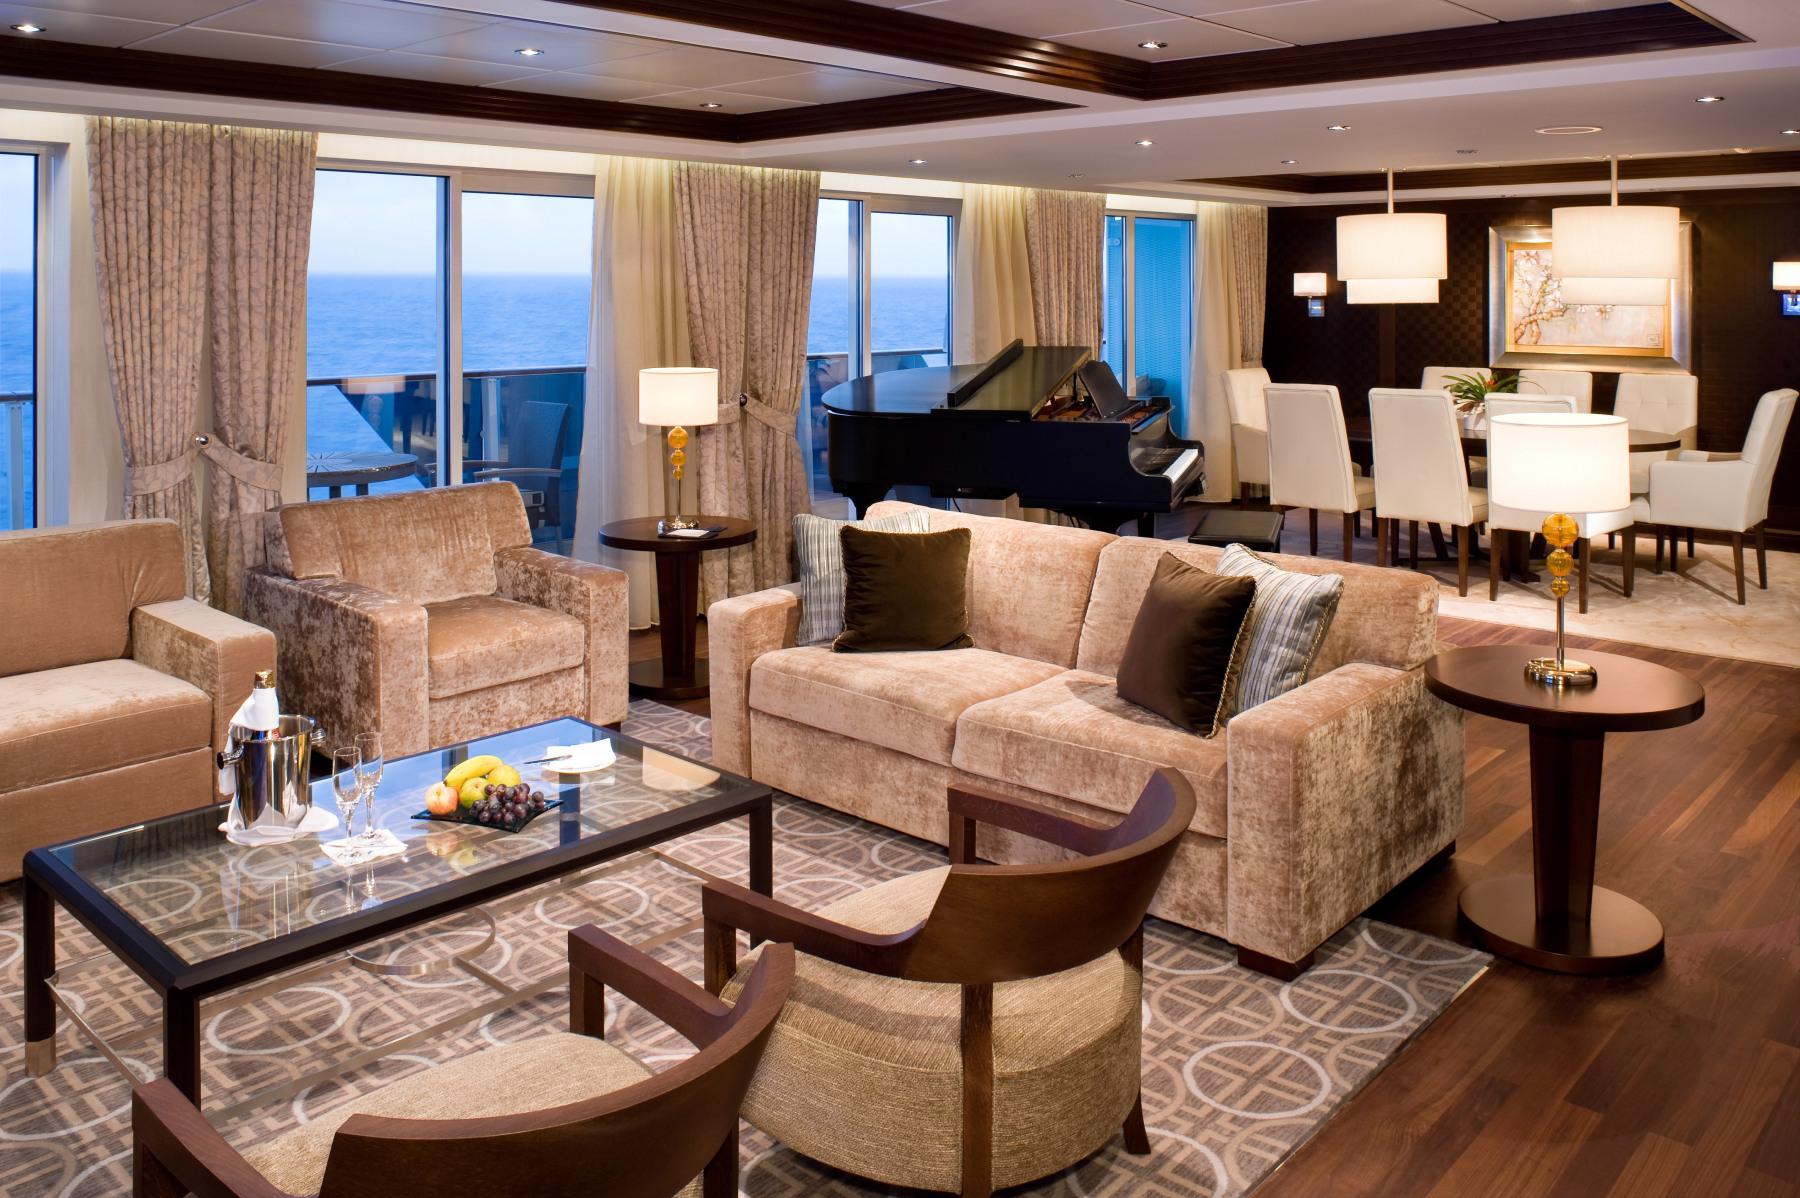 celebrity cruises celebrity eclipse accommodation penthouse suite.jpg